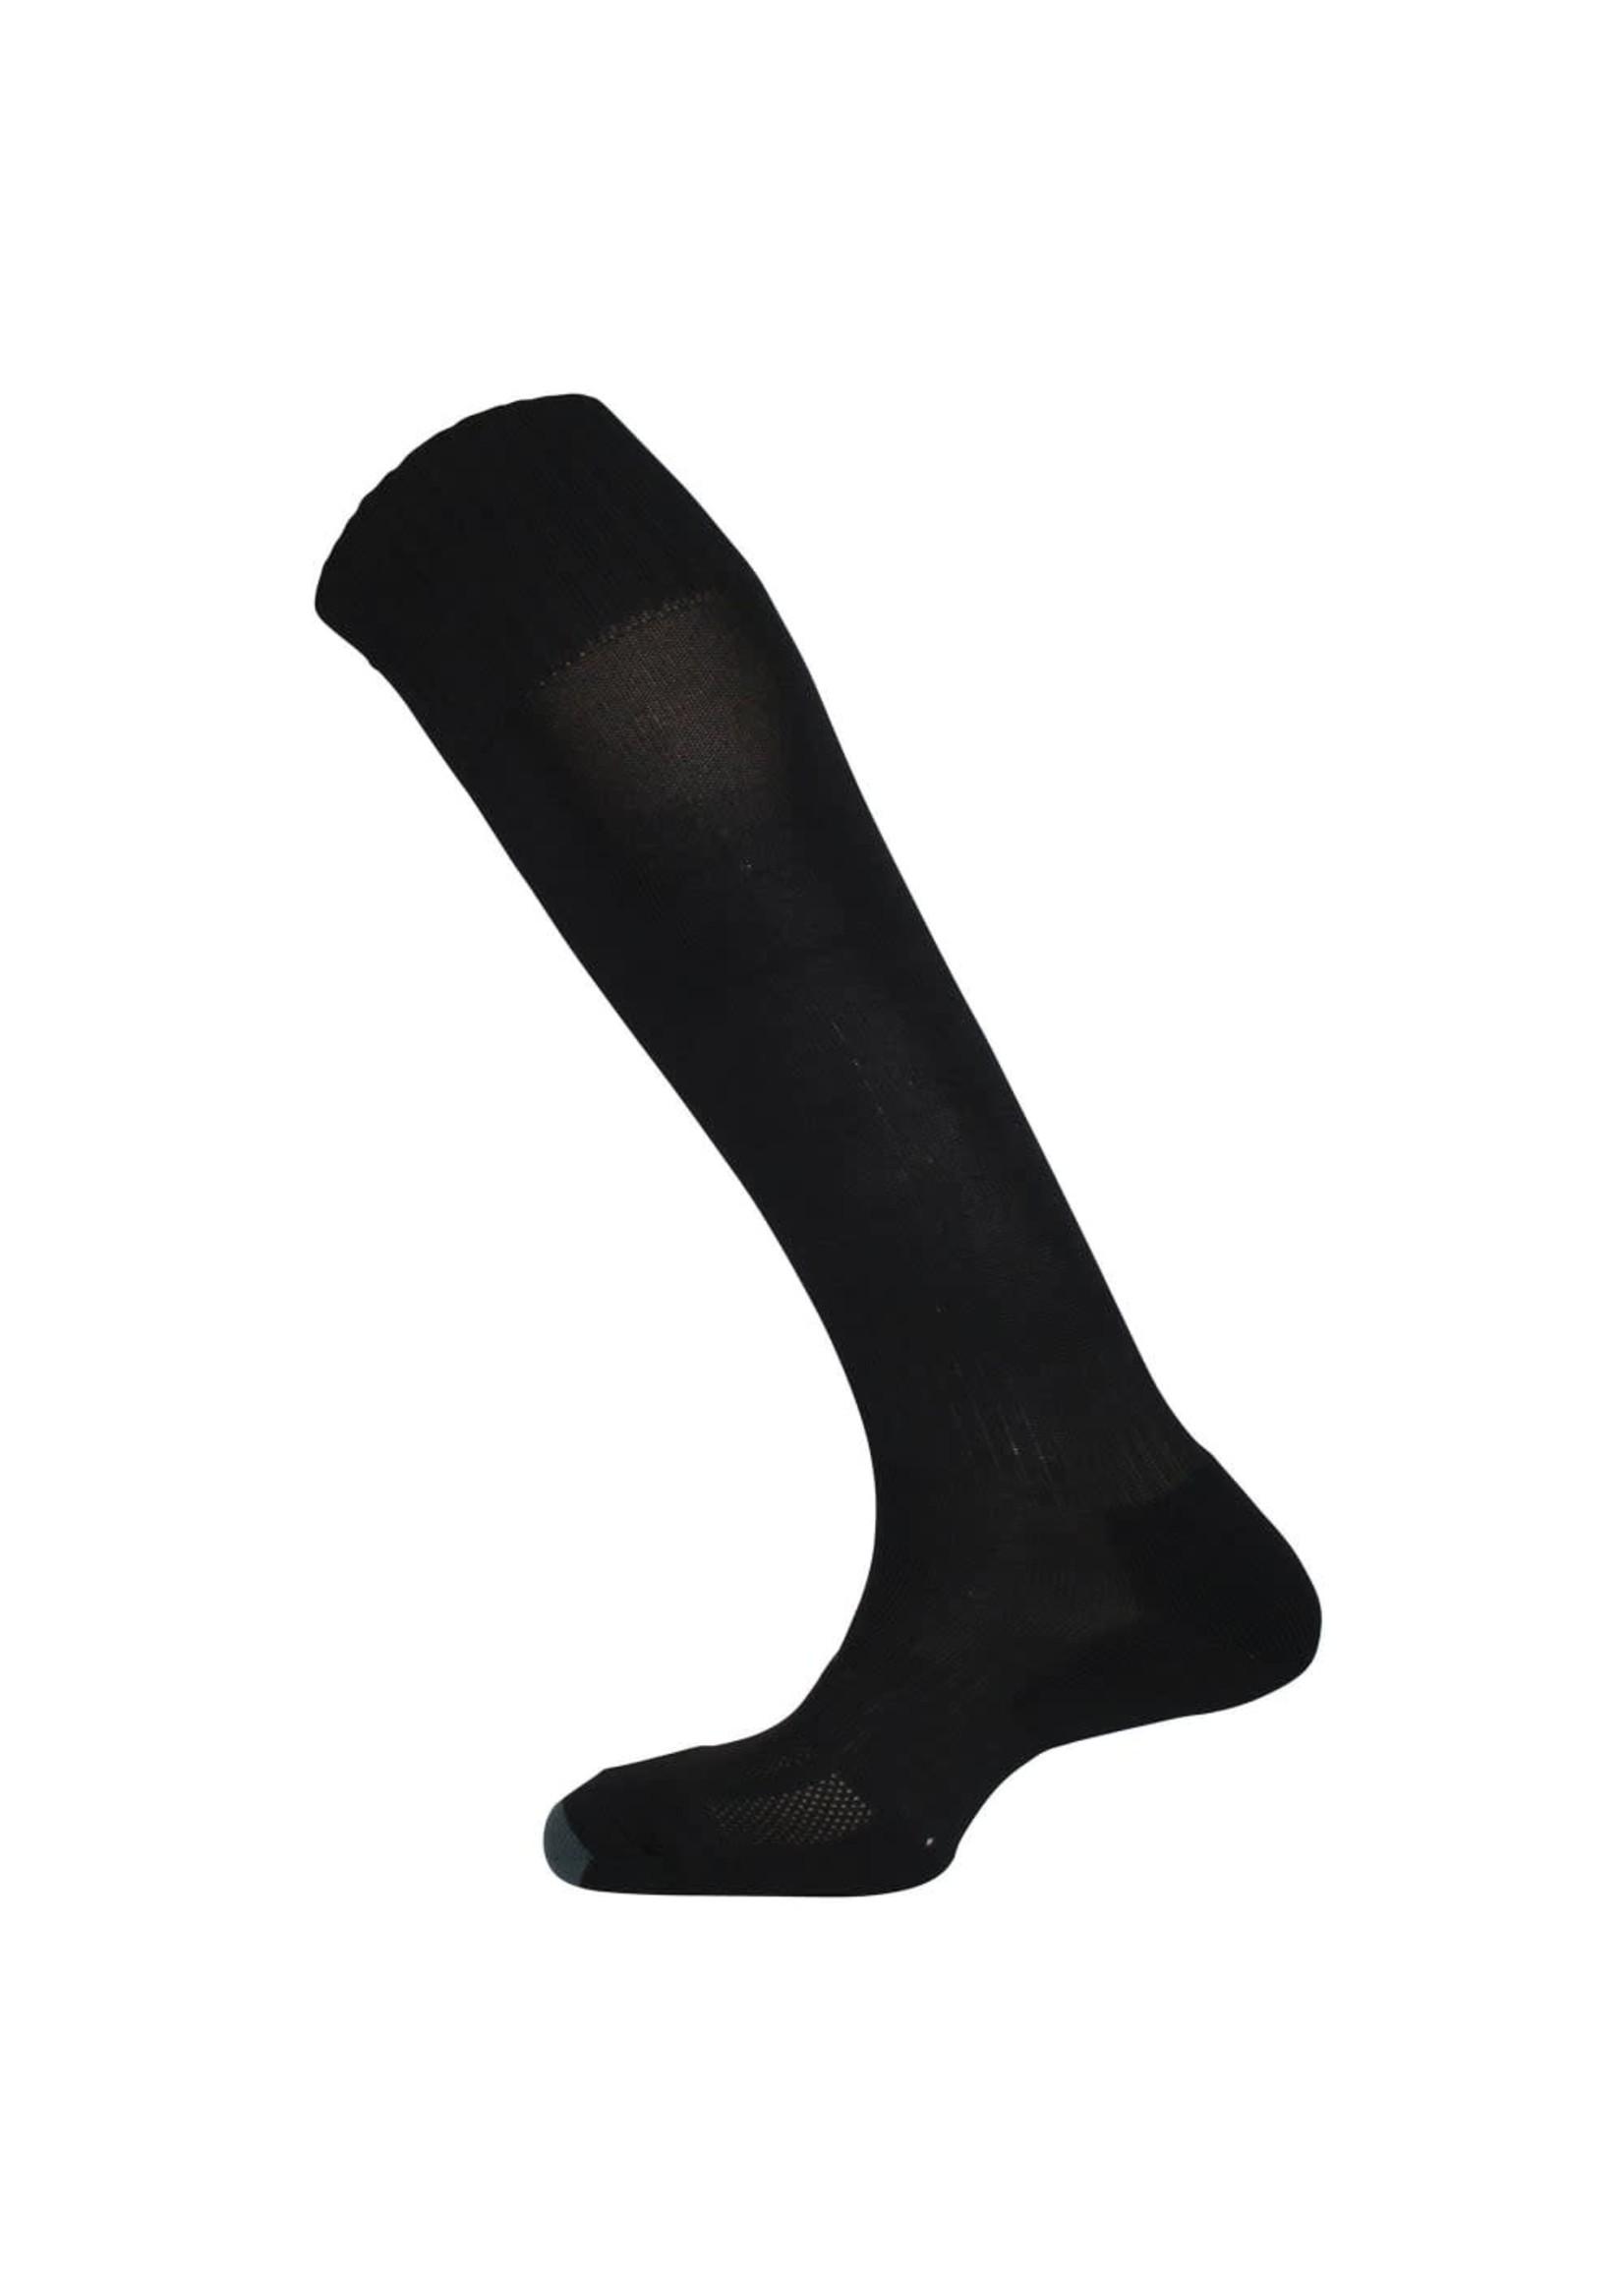 mitre Mitre Mercury Teamwear Socks, 7-12UK